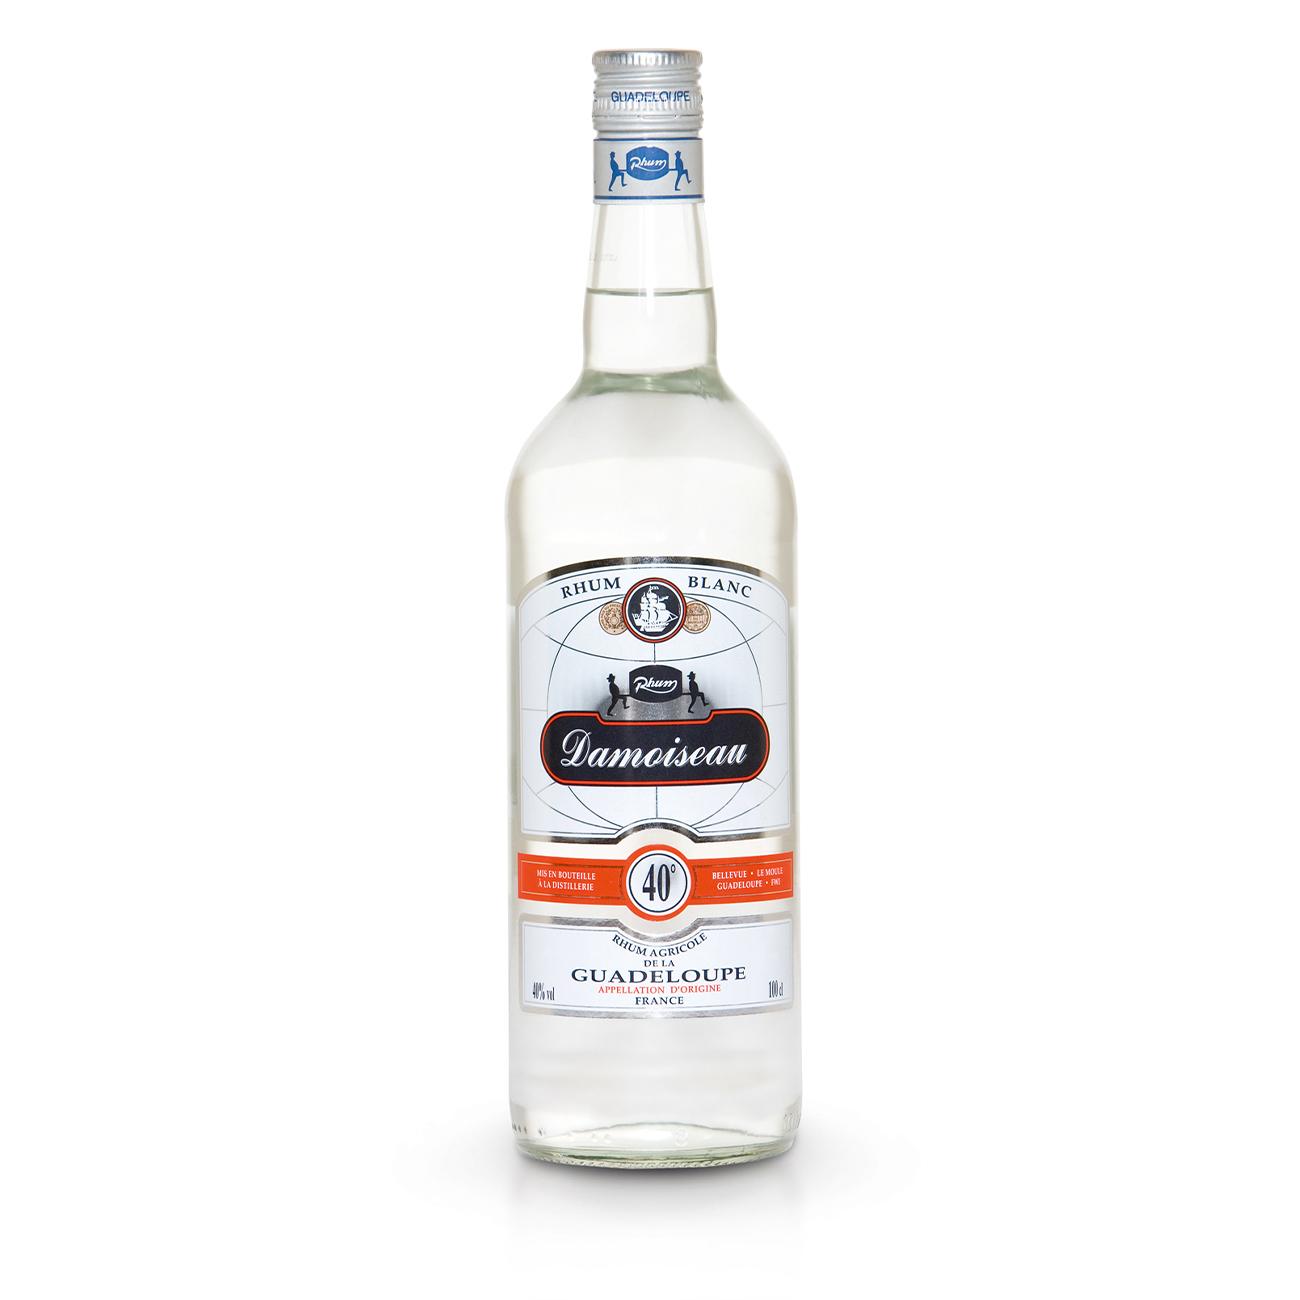 Damoiseau White 40% Rhum